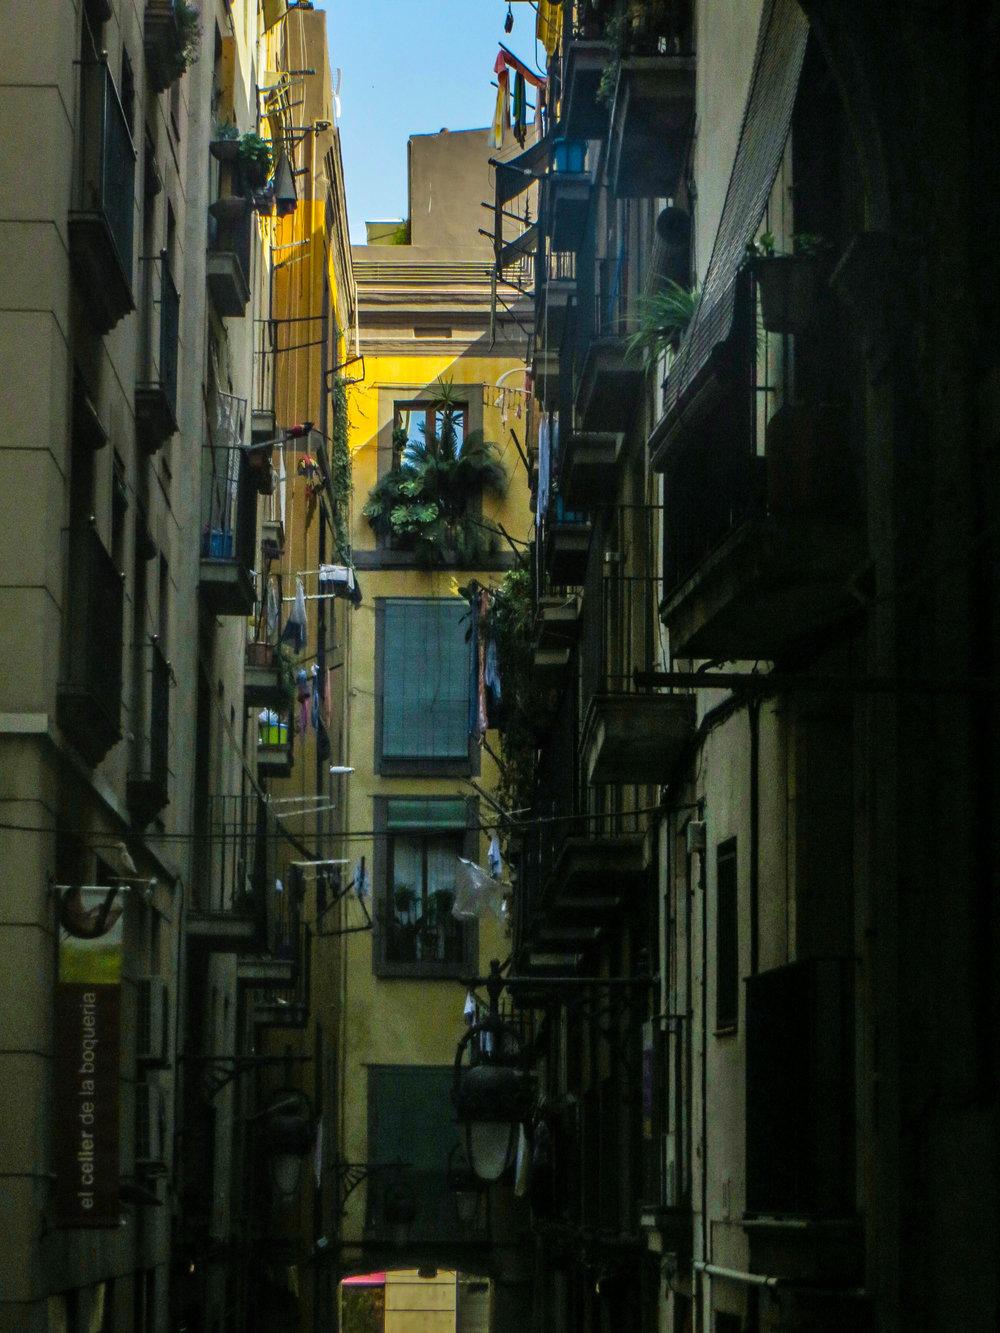 barcelona-spain-catalonia-17.jpg